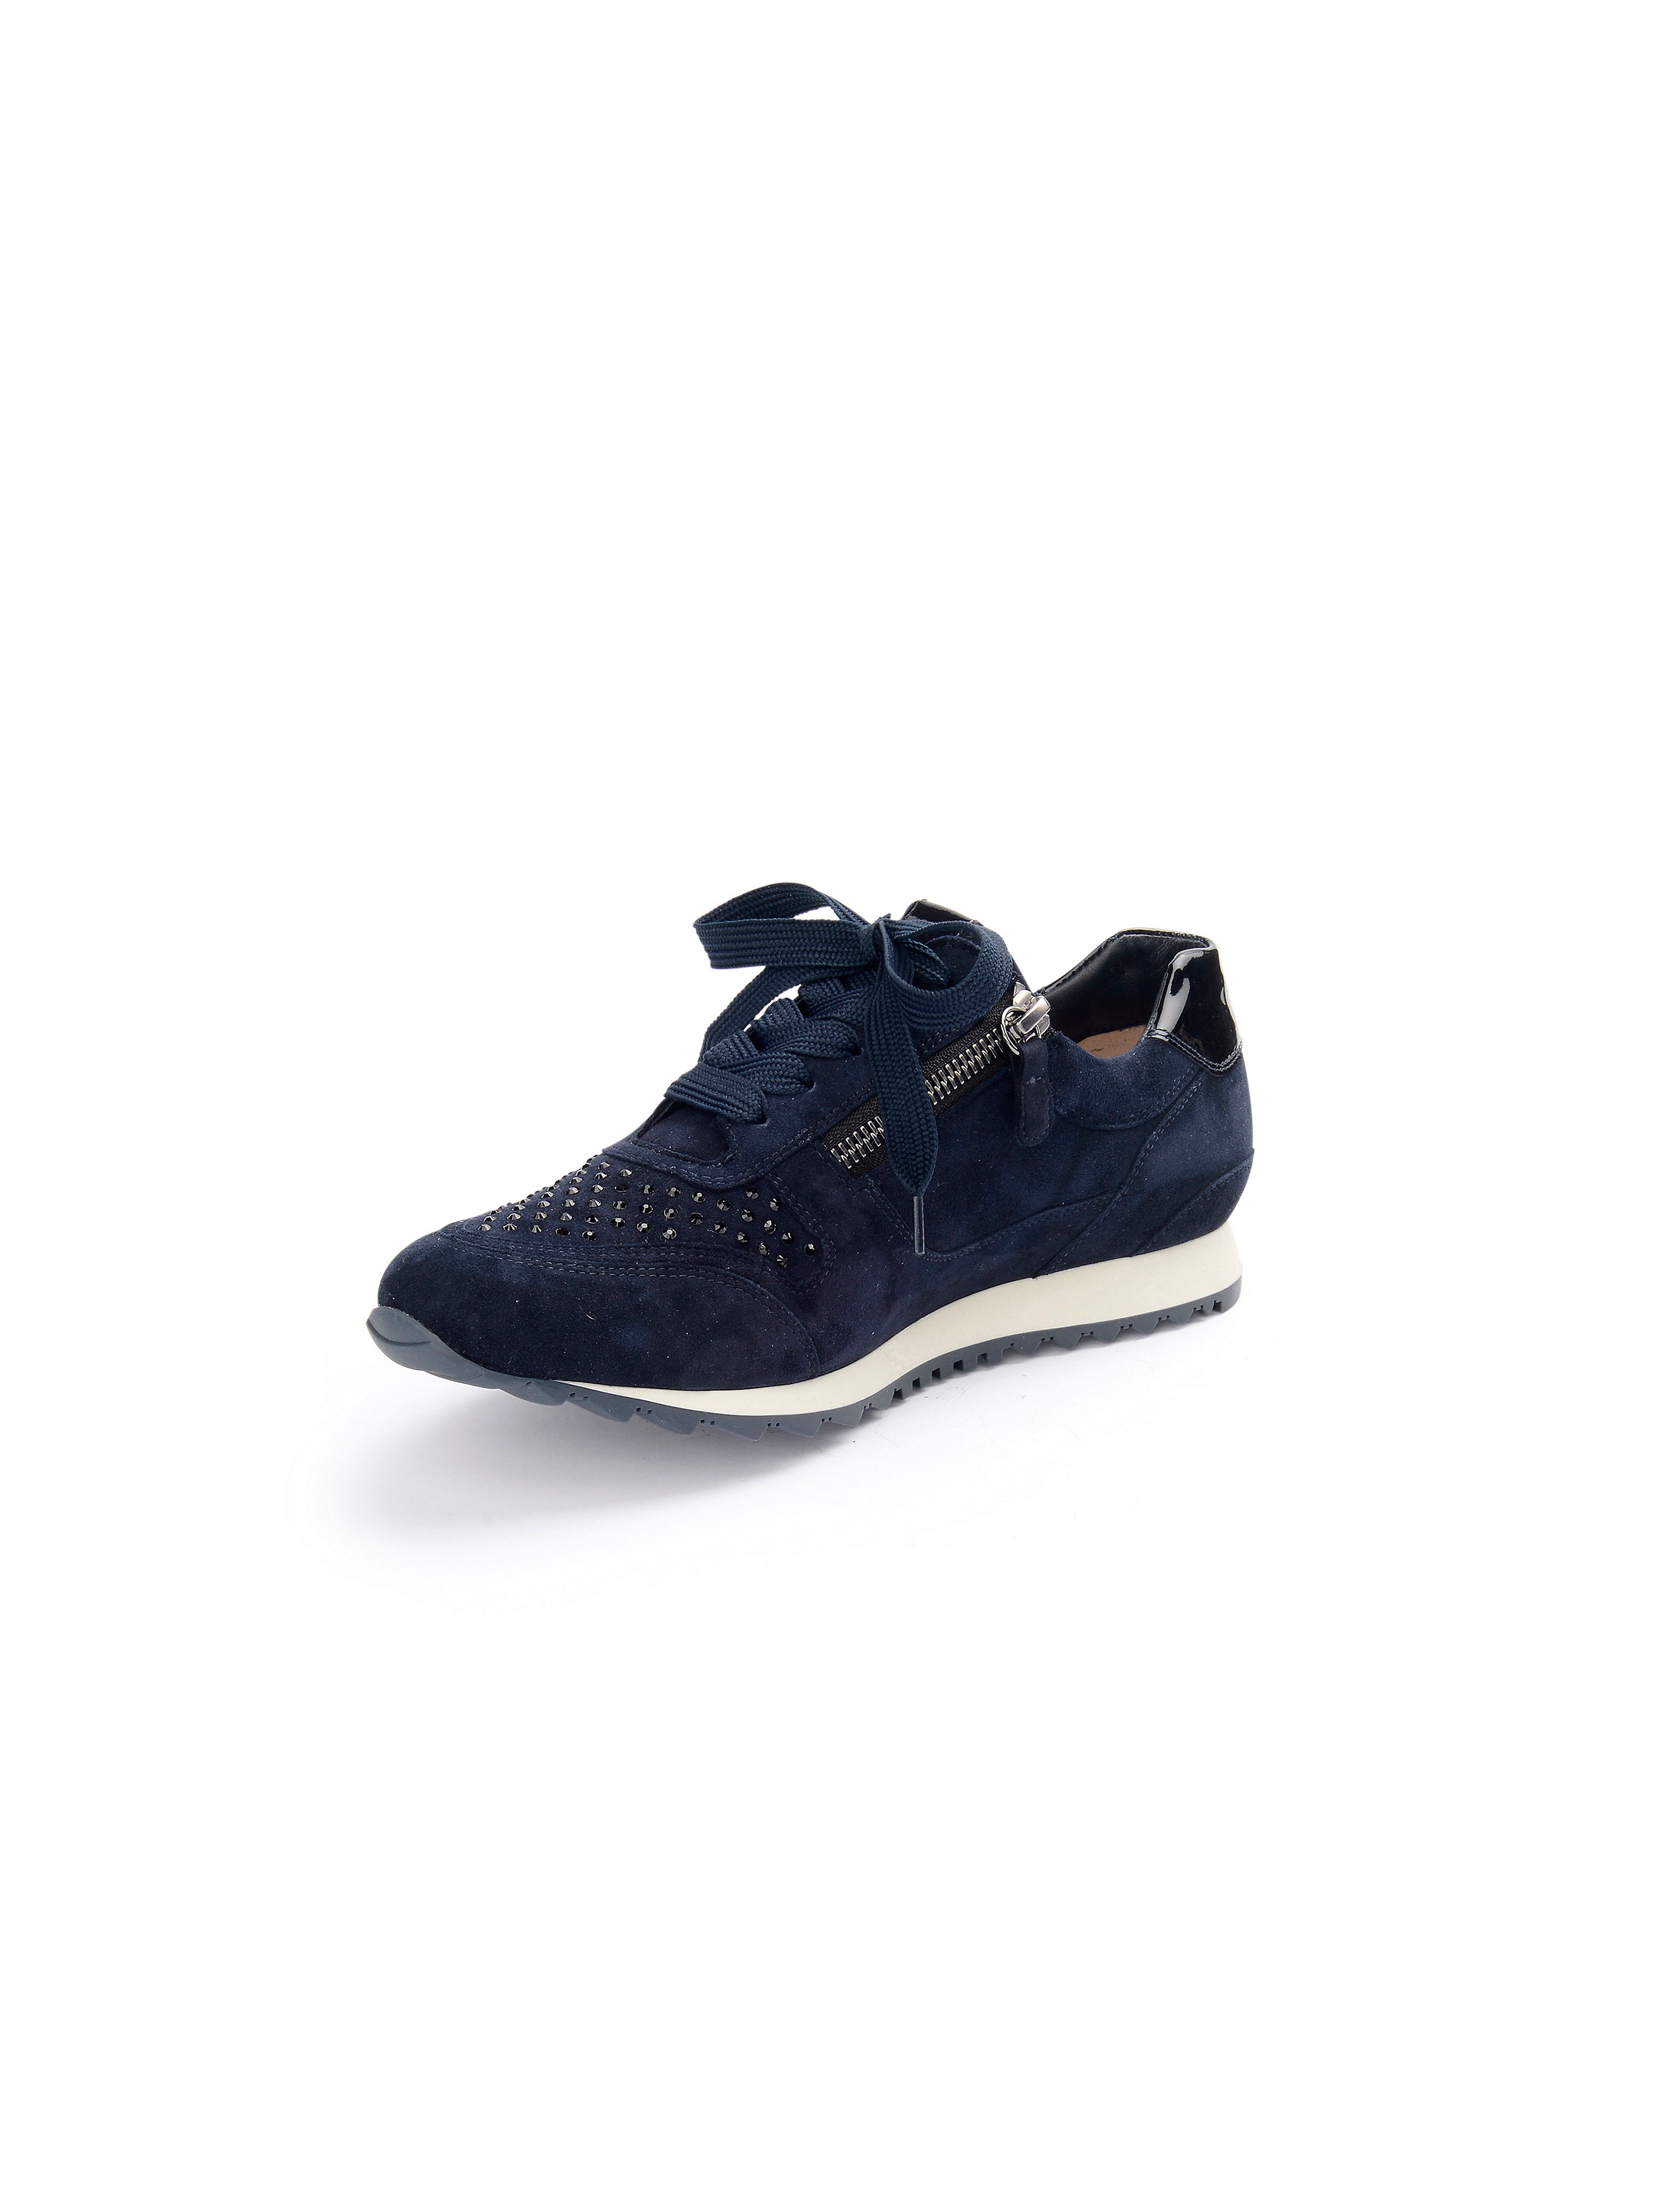 Sneaker Barcelona H aus 100% Leder Hassia blau